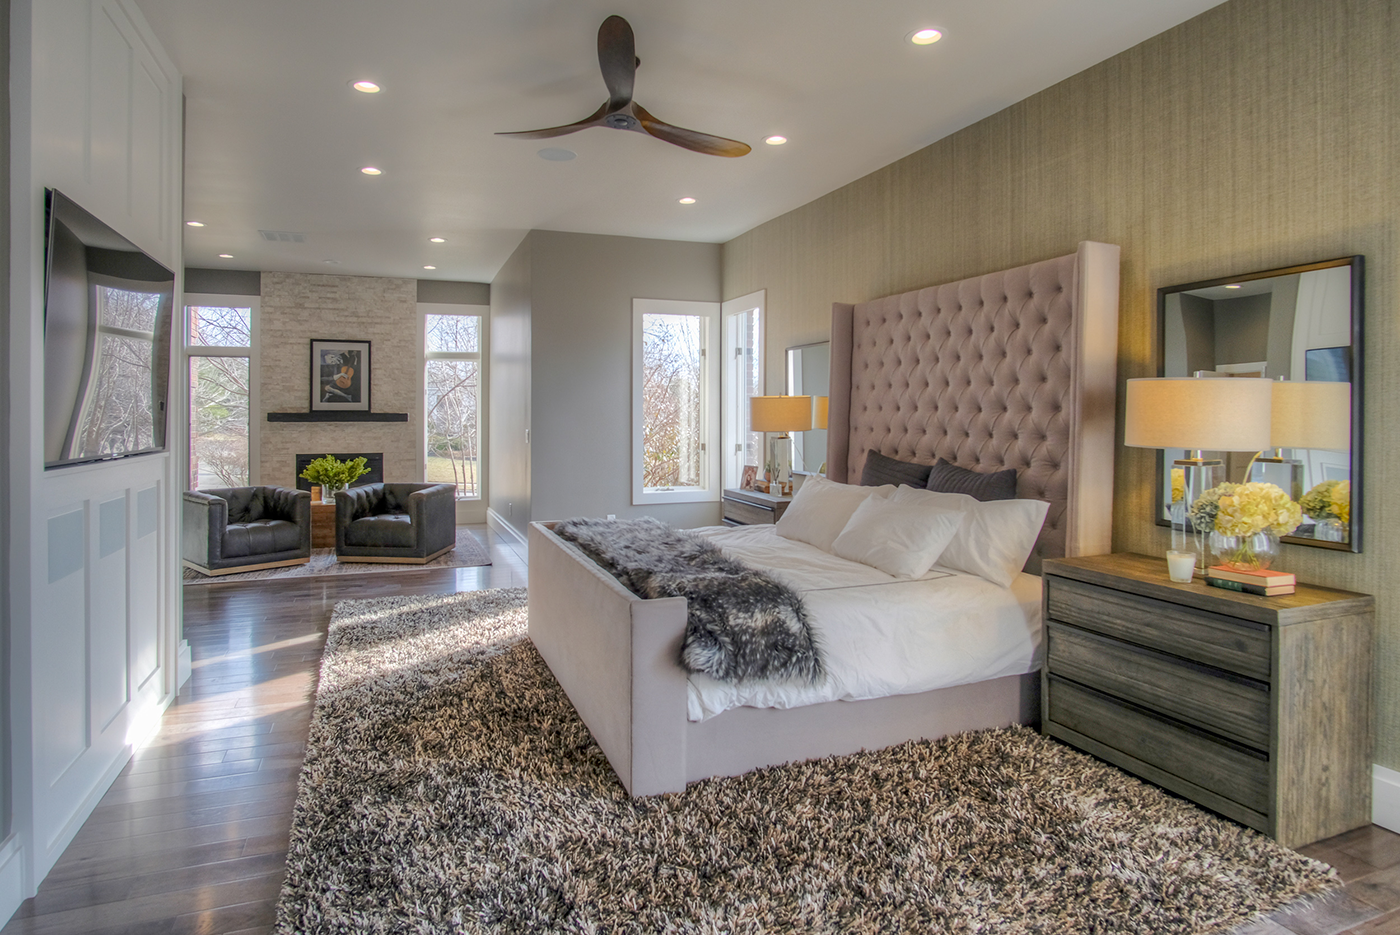 Furniture, Gifts, Home Decor, Interior Designers